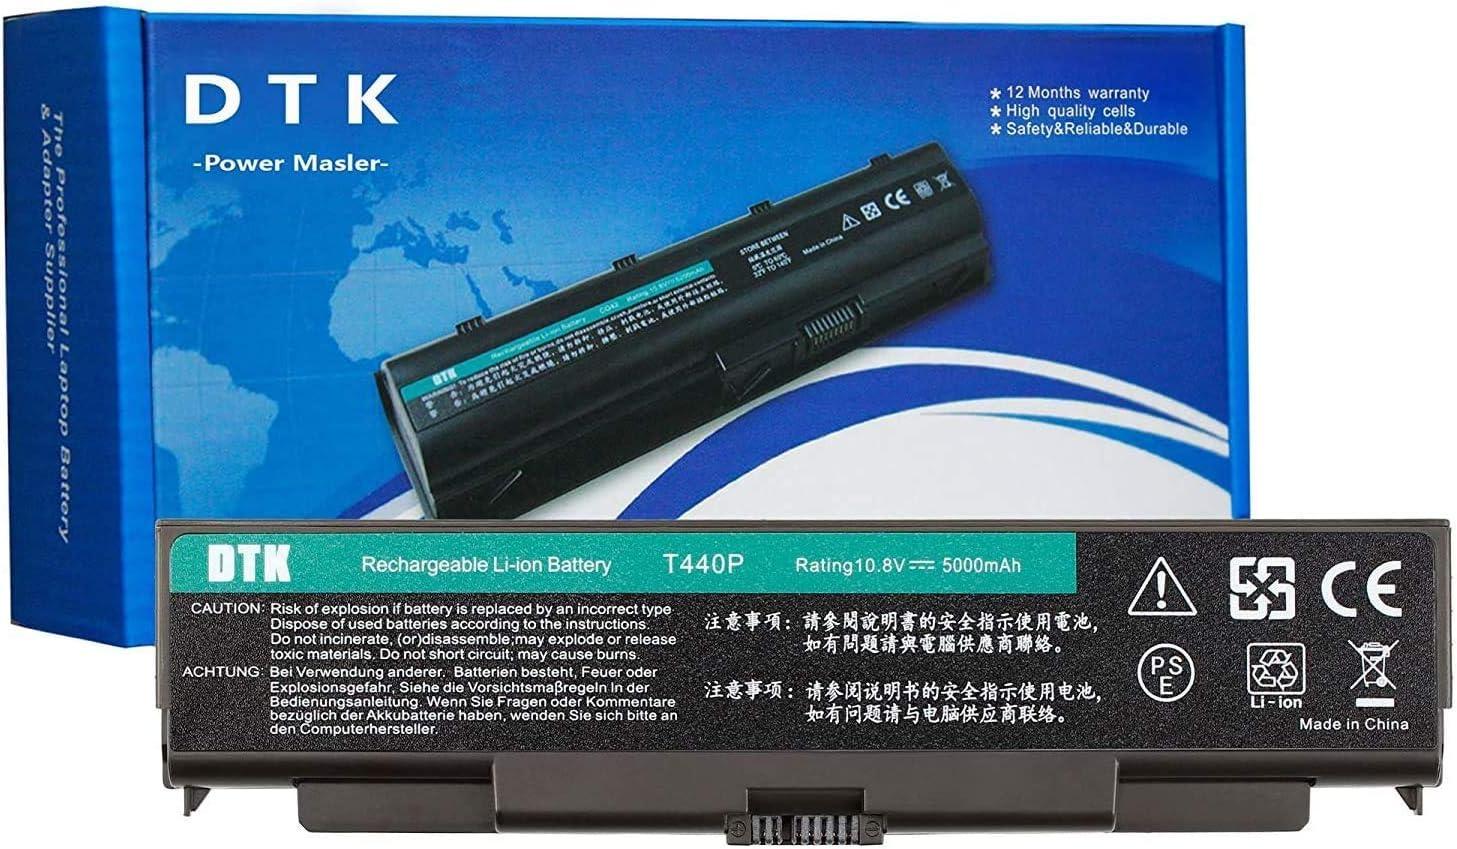 DTK 0C52863 0C52864 New Laptop Battery for Lenovo ThinkPad T440P 3S2P T540P L440 L540 W540 Notebook Computer Battery 10.8V 5000mAh